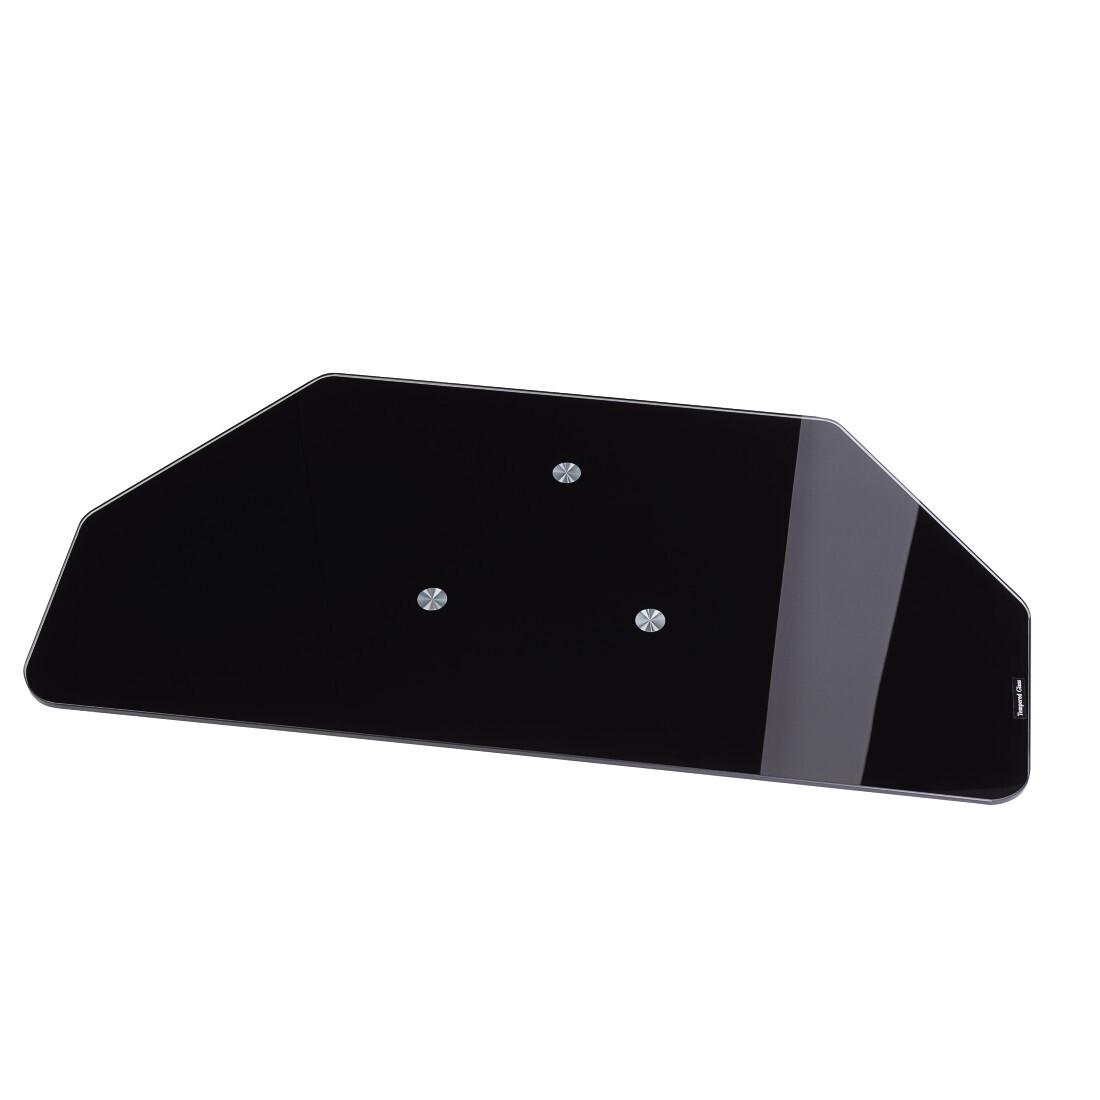 Hama LCD-/Plasma-TV-rotary, glass, black, up to 32